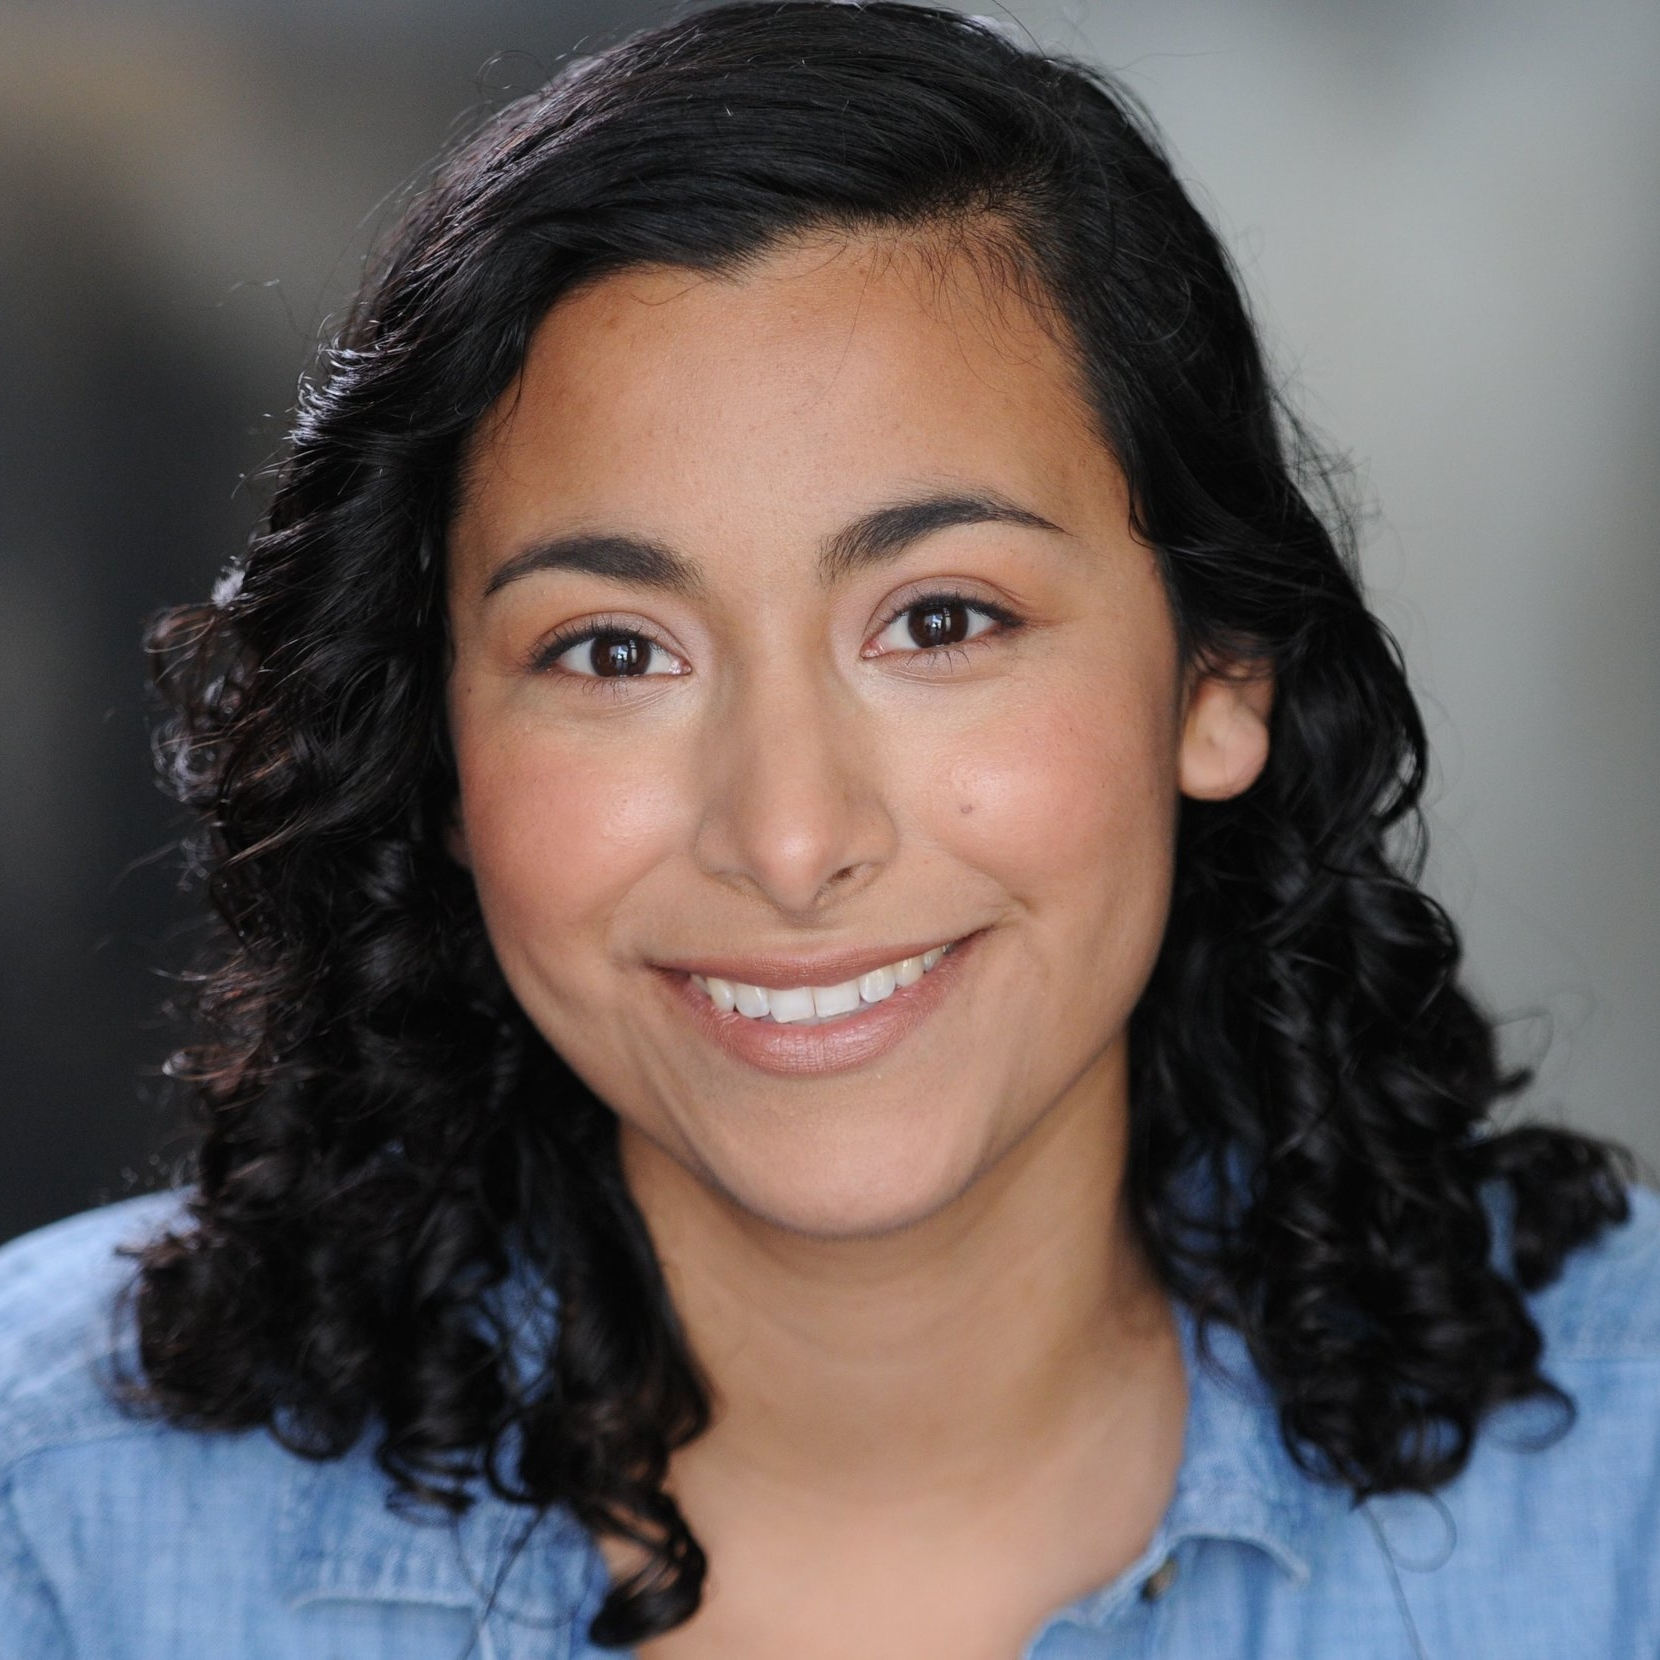 Carla Gallardo